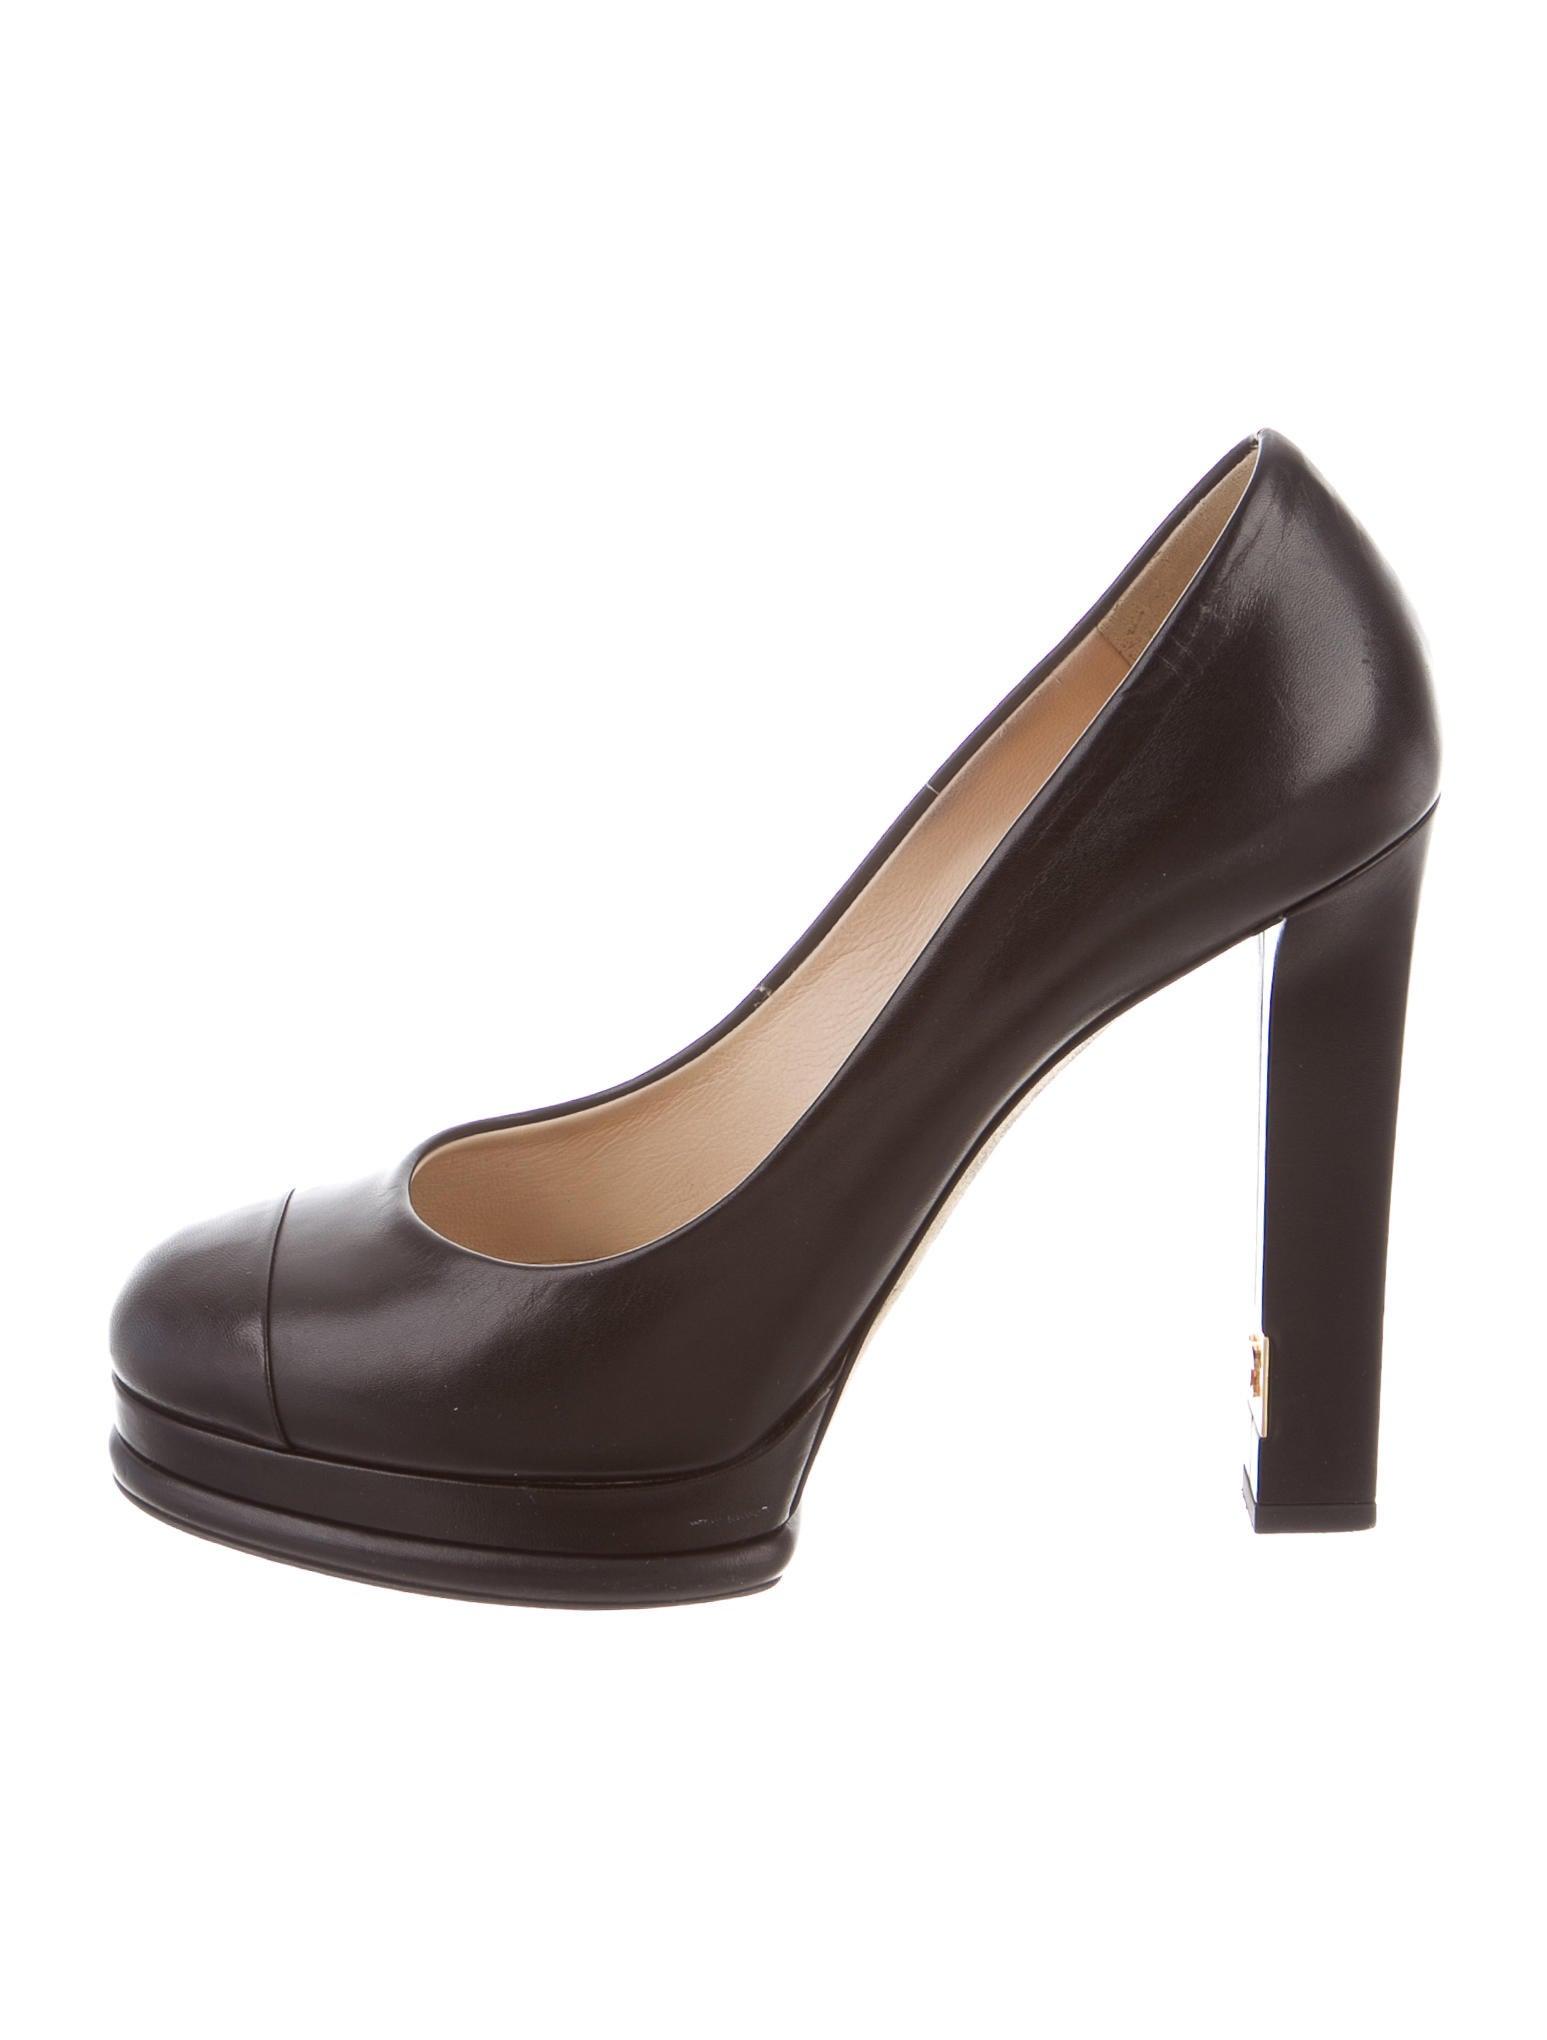 chanel leather platform pumps shoes cha160092 the